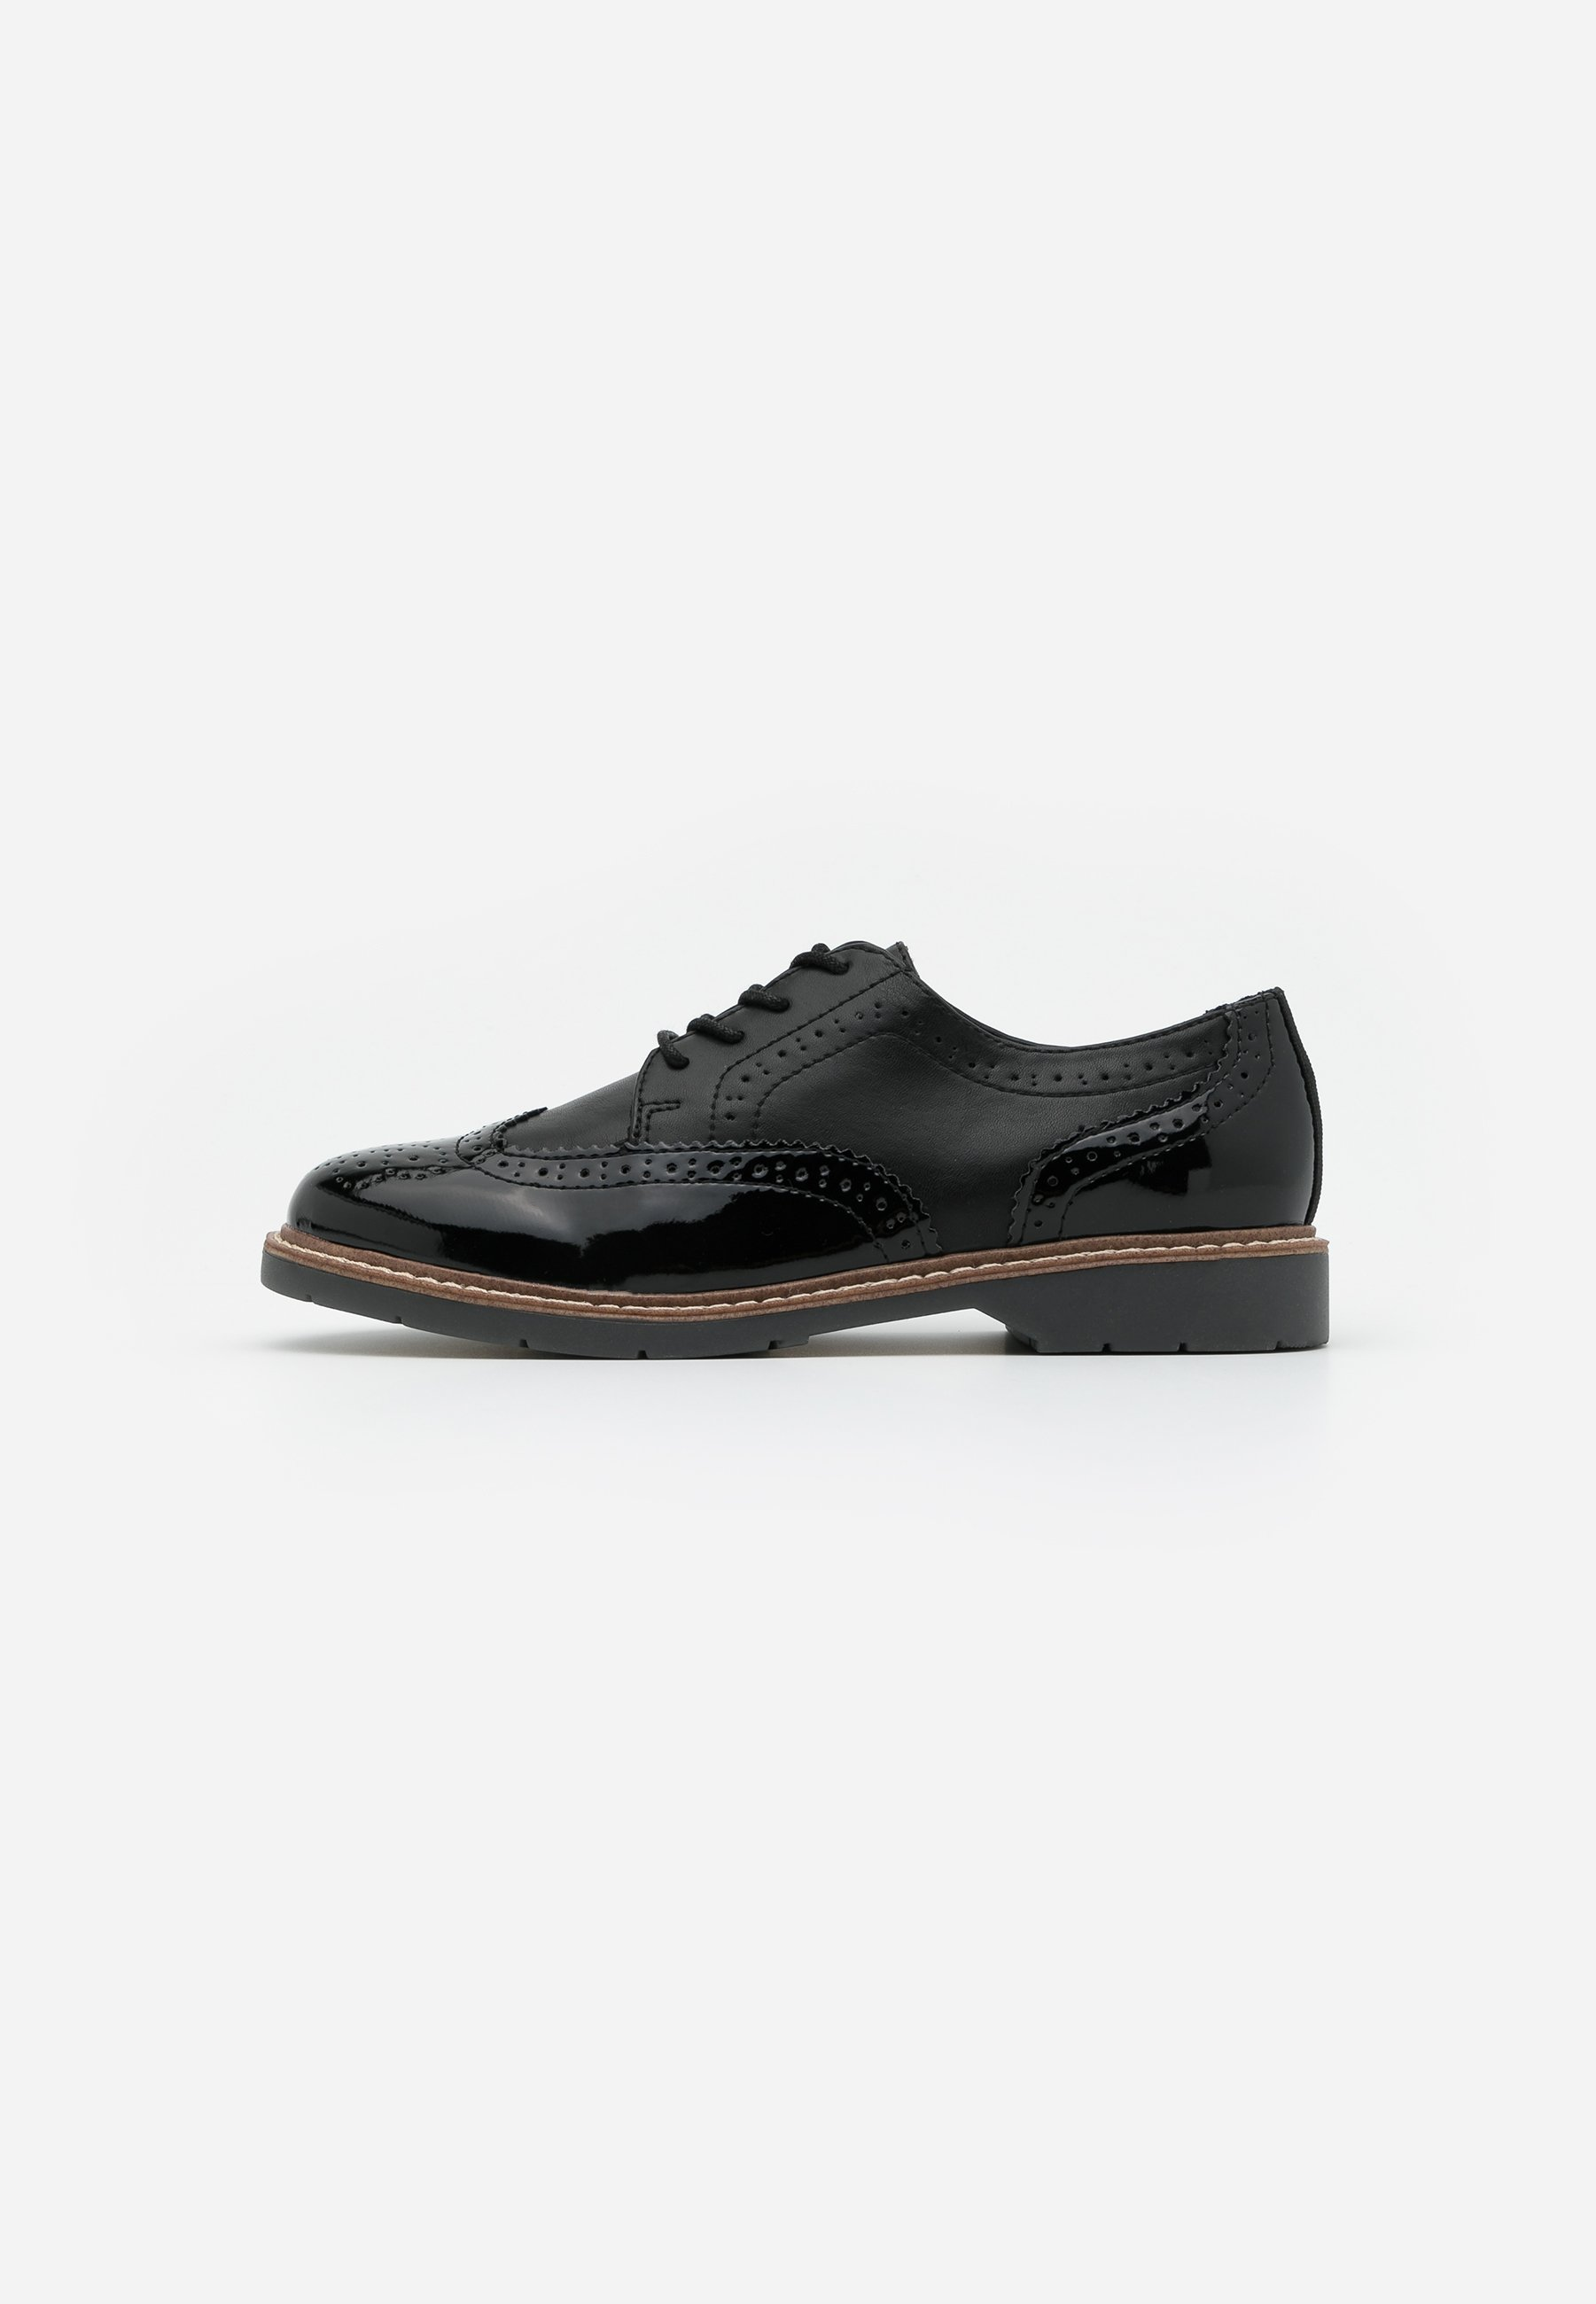 S.oliver Lace Up - Stringate Black t15ia